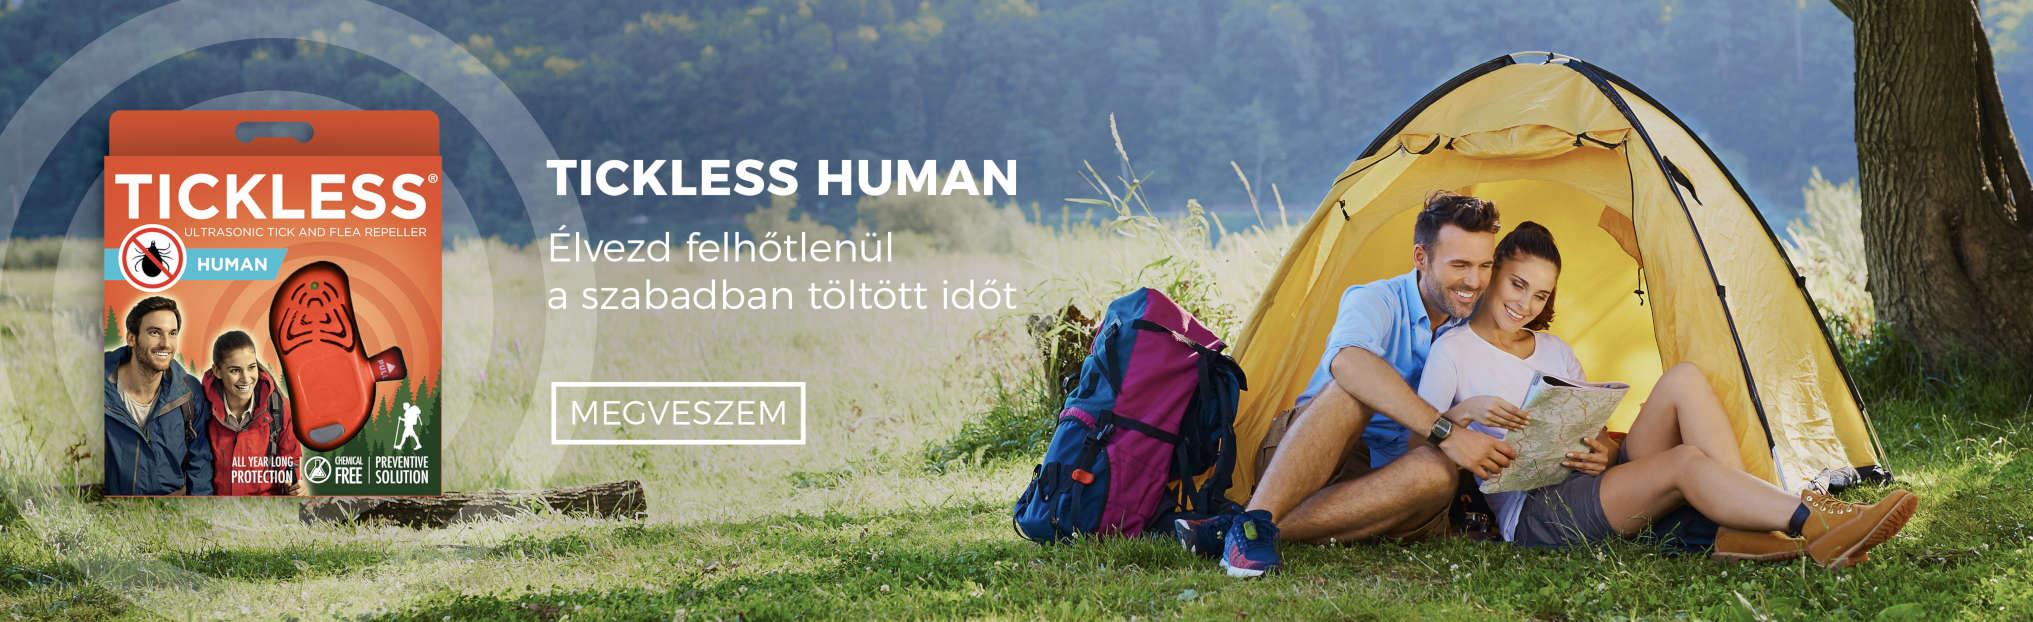 tickless_slider_human_magyar_geri_2033